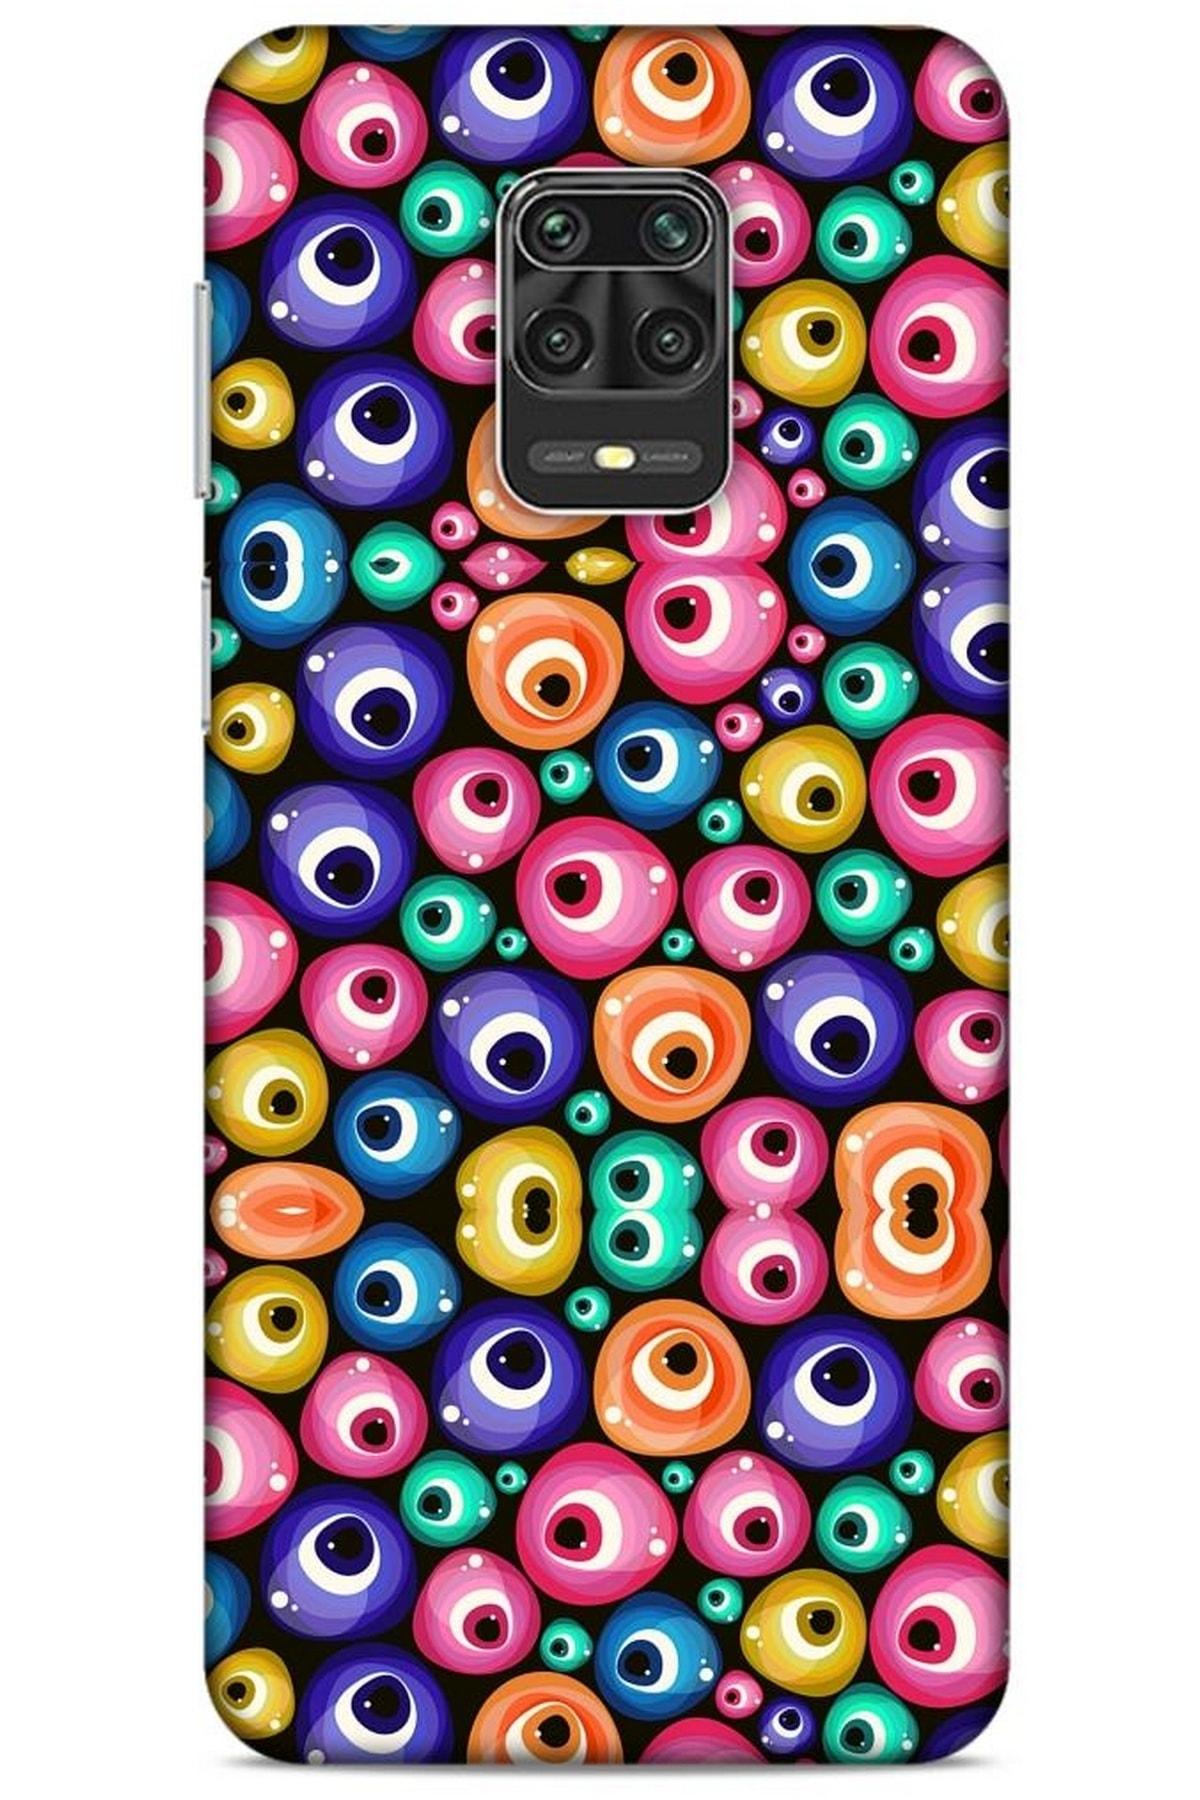 Lopard Nazarium (9) Desenli Silikon Kapak Xiaomi Redmi Note 9 Pro Kılıf 1